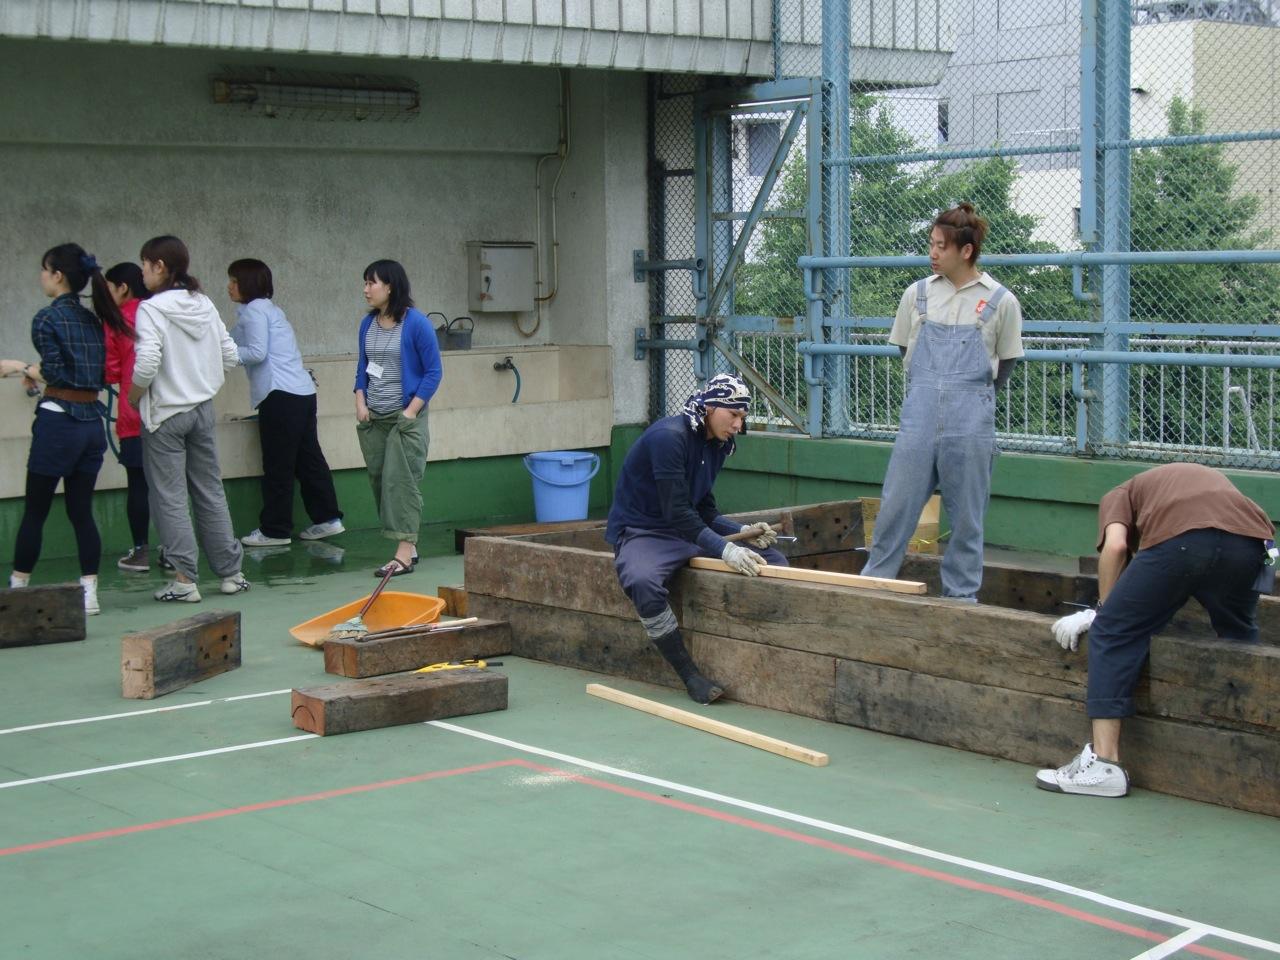 http://blog.3331.jp/staff/file/DSC03354.jpg